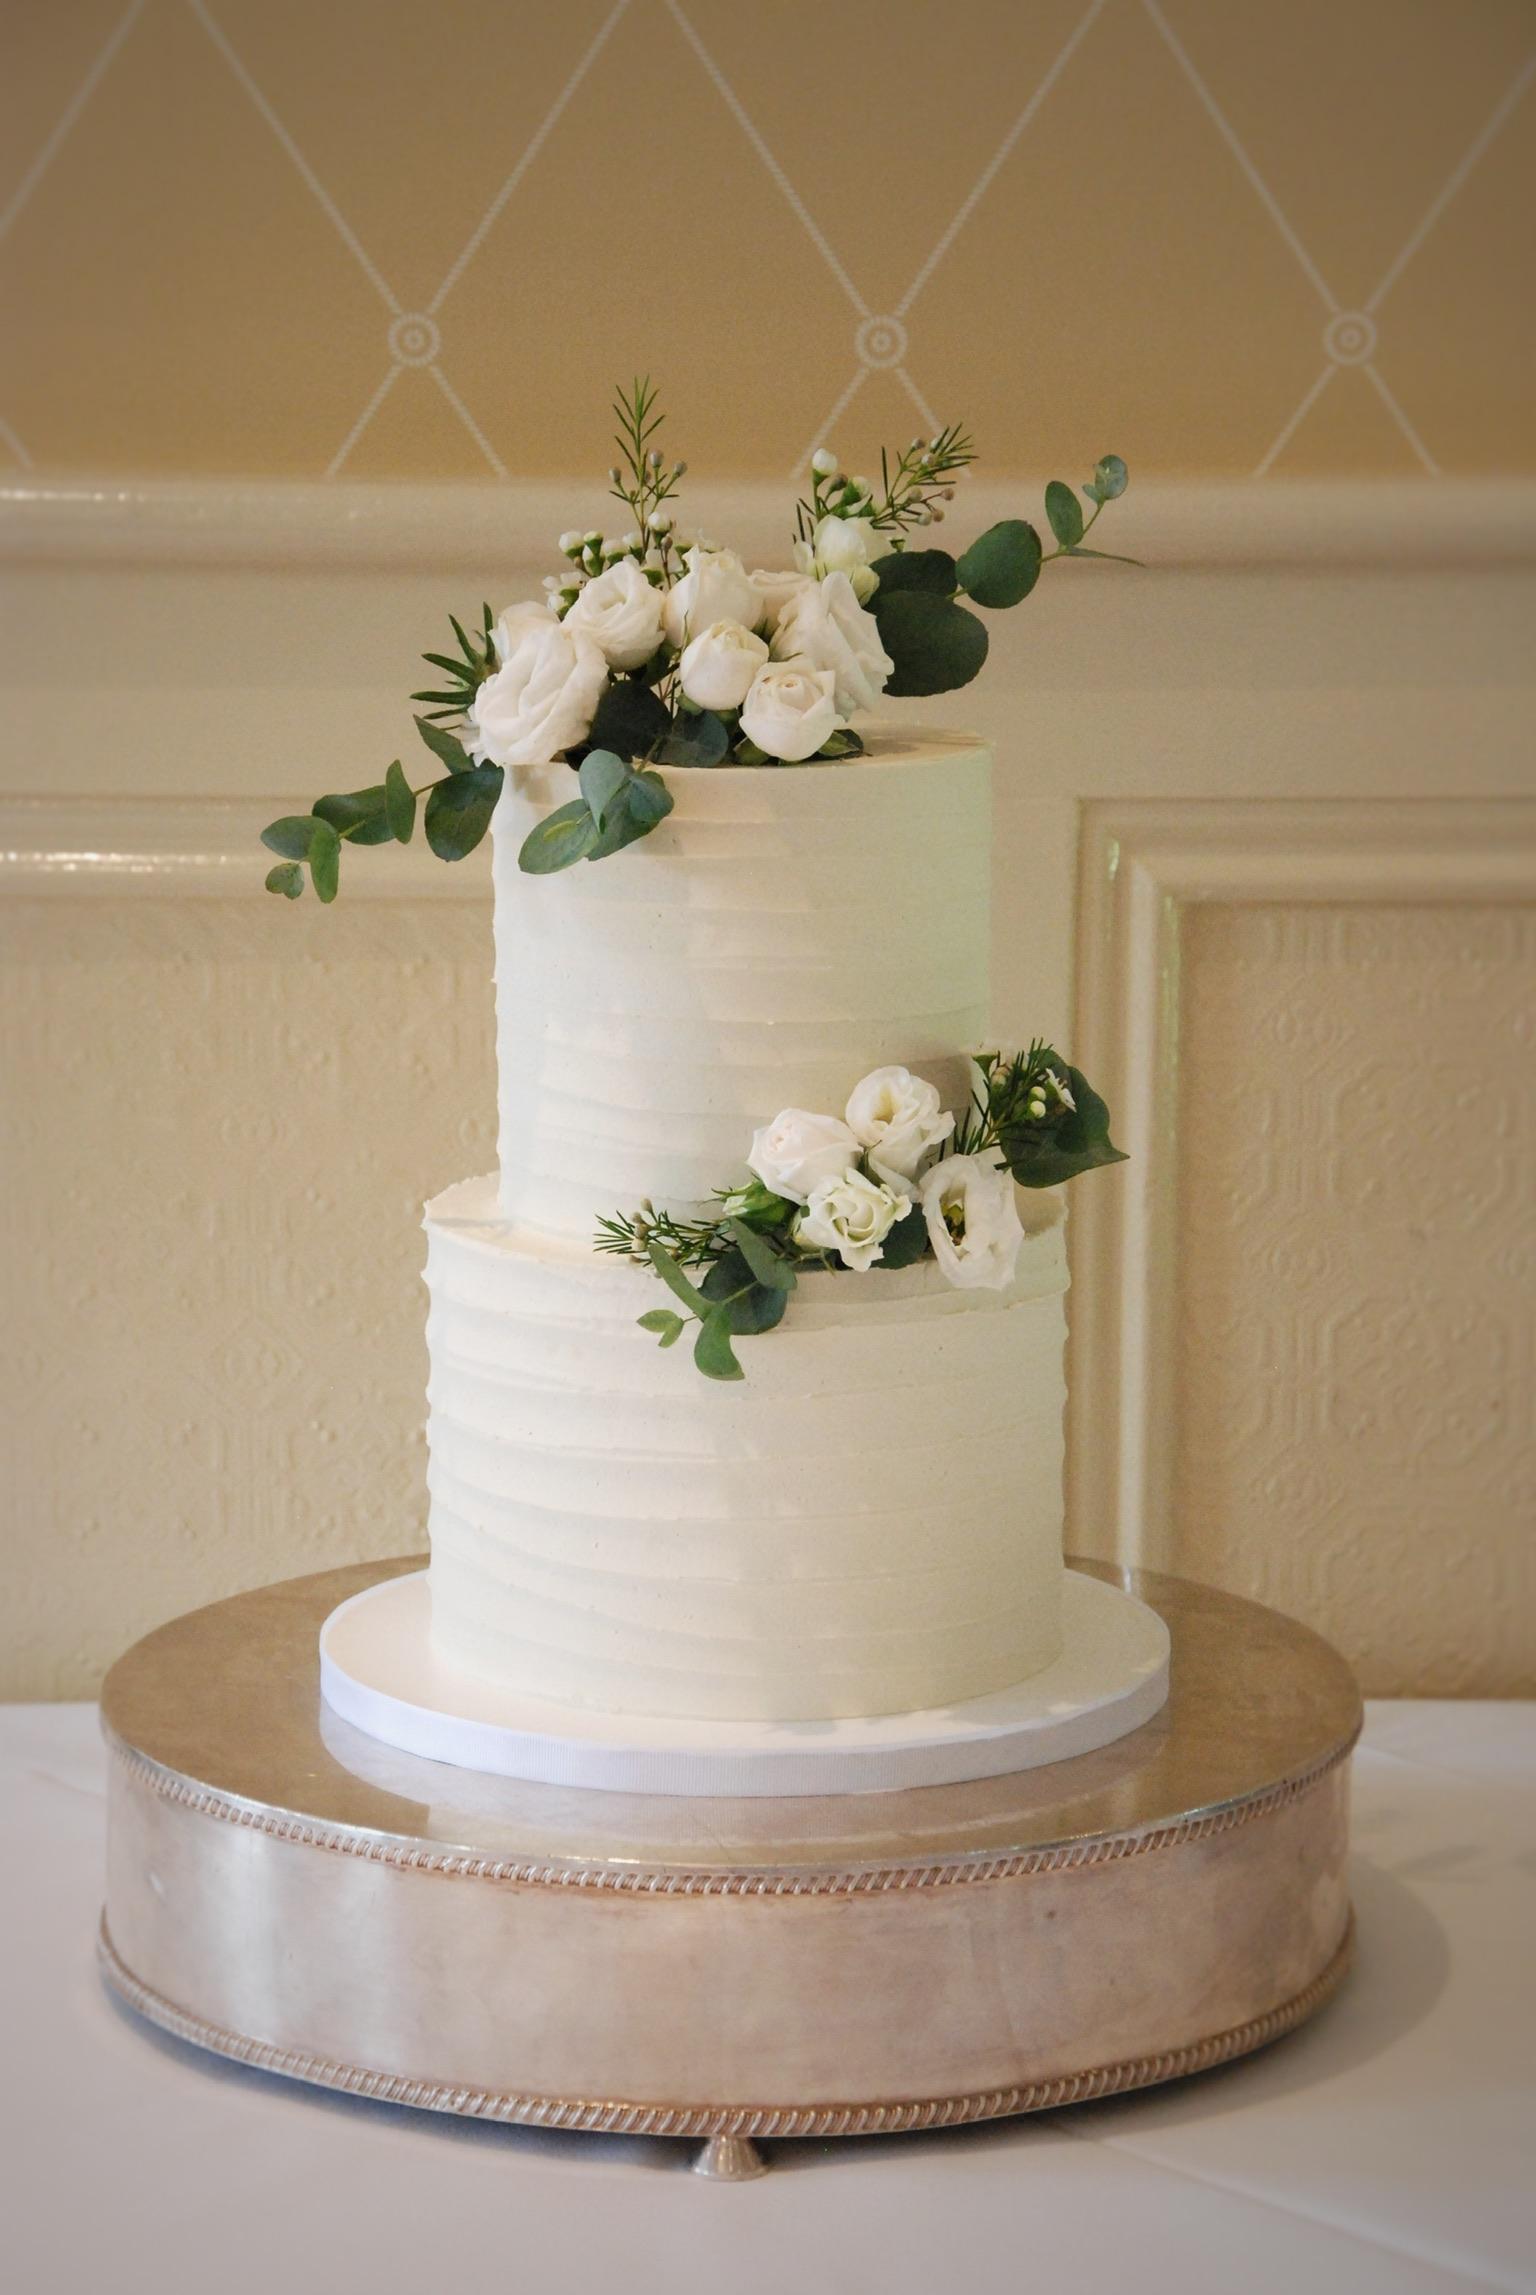 Classic buttercream wedding cake